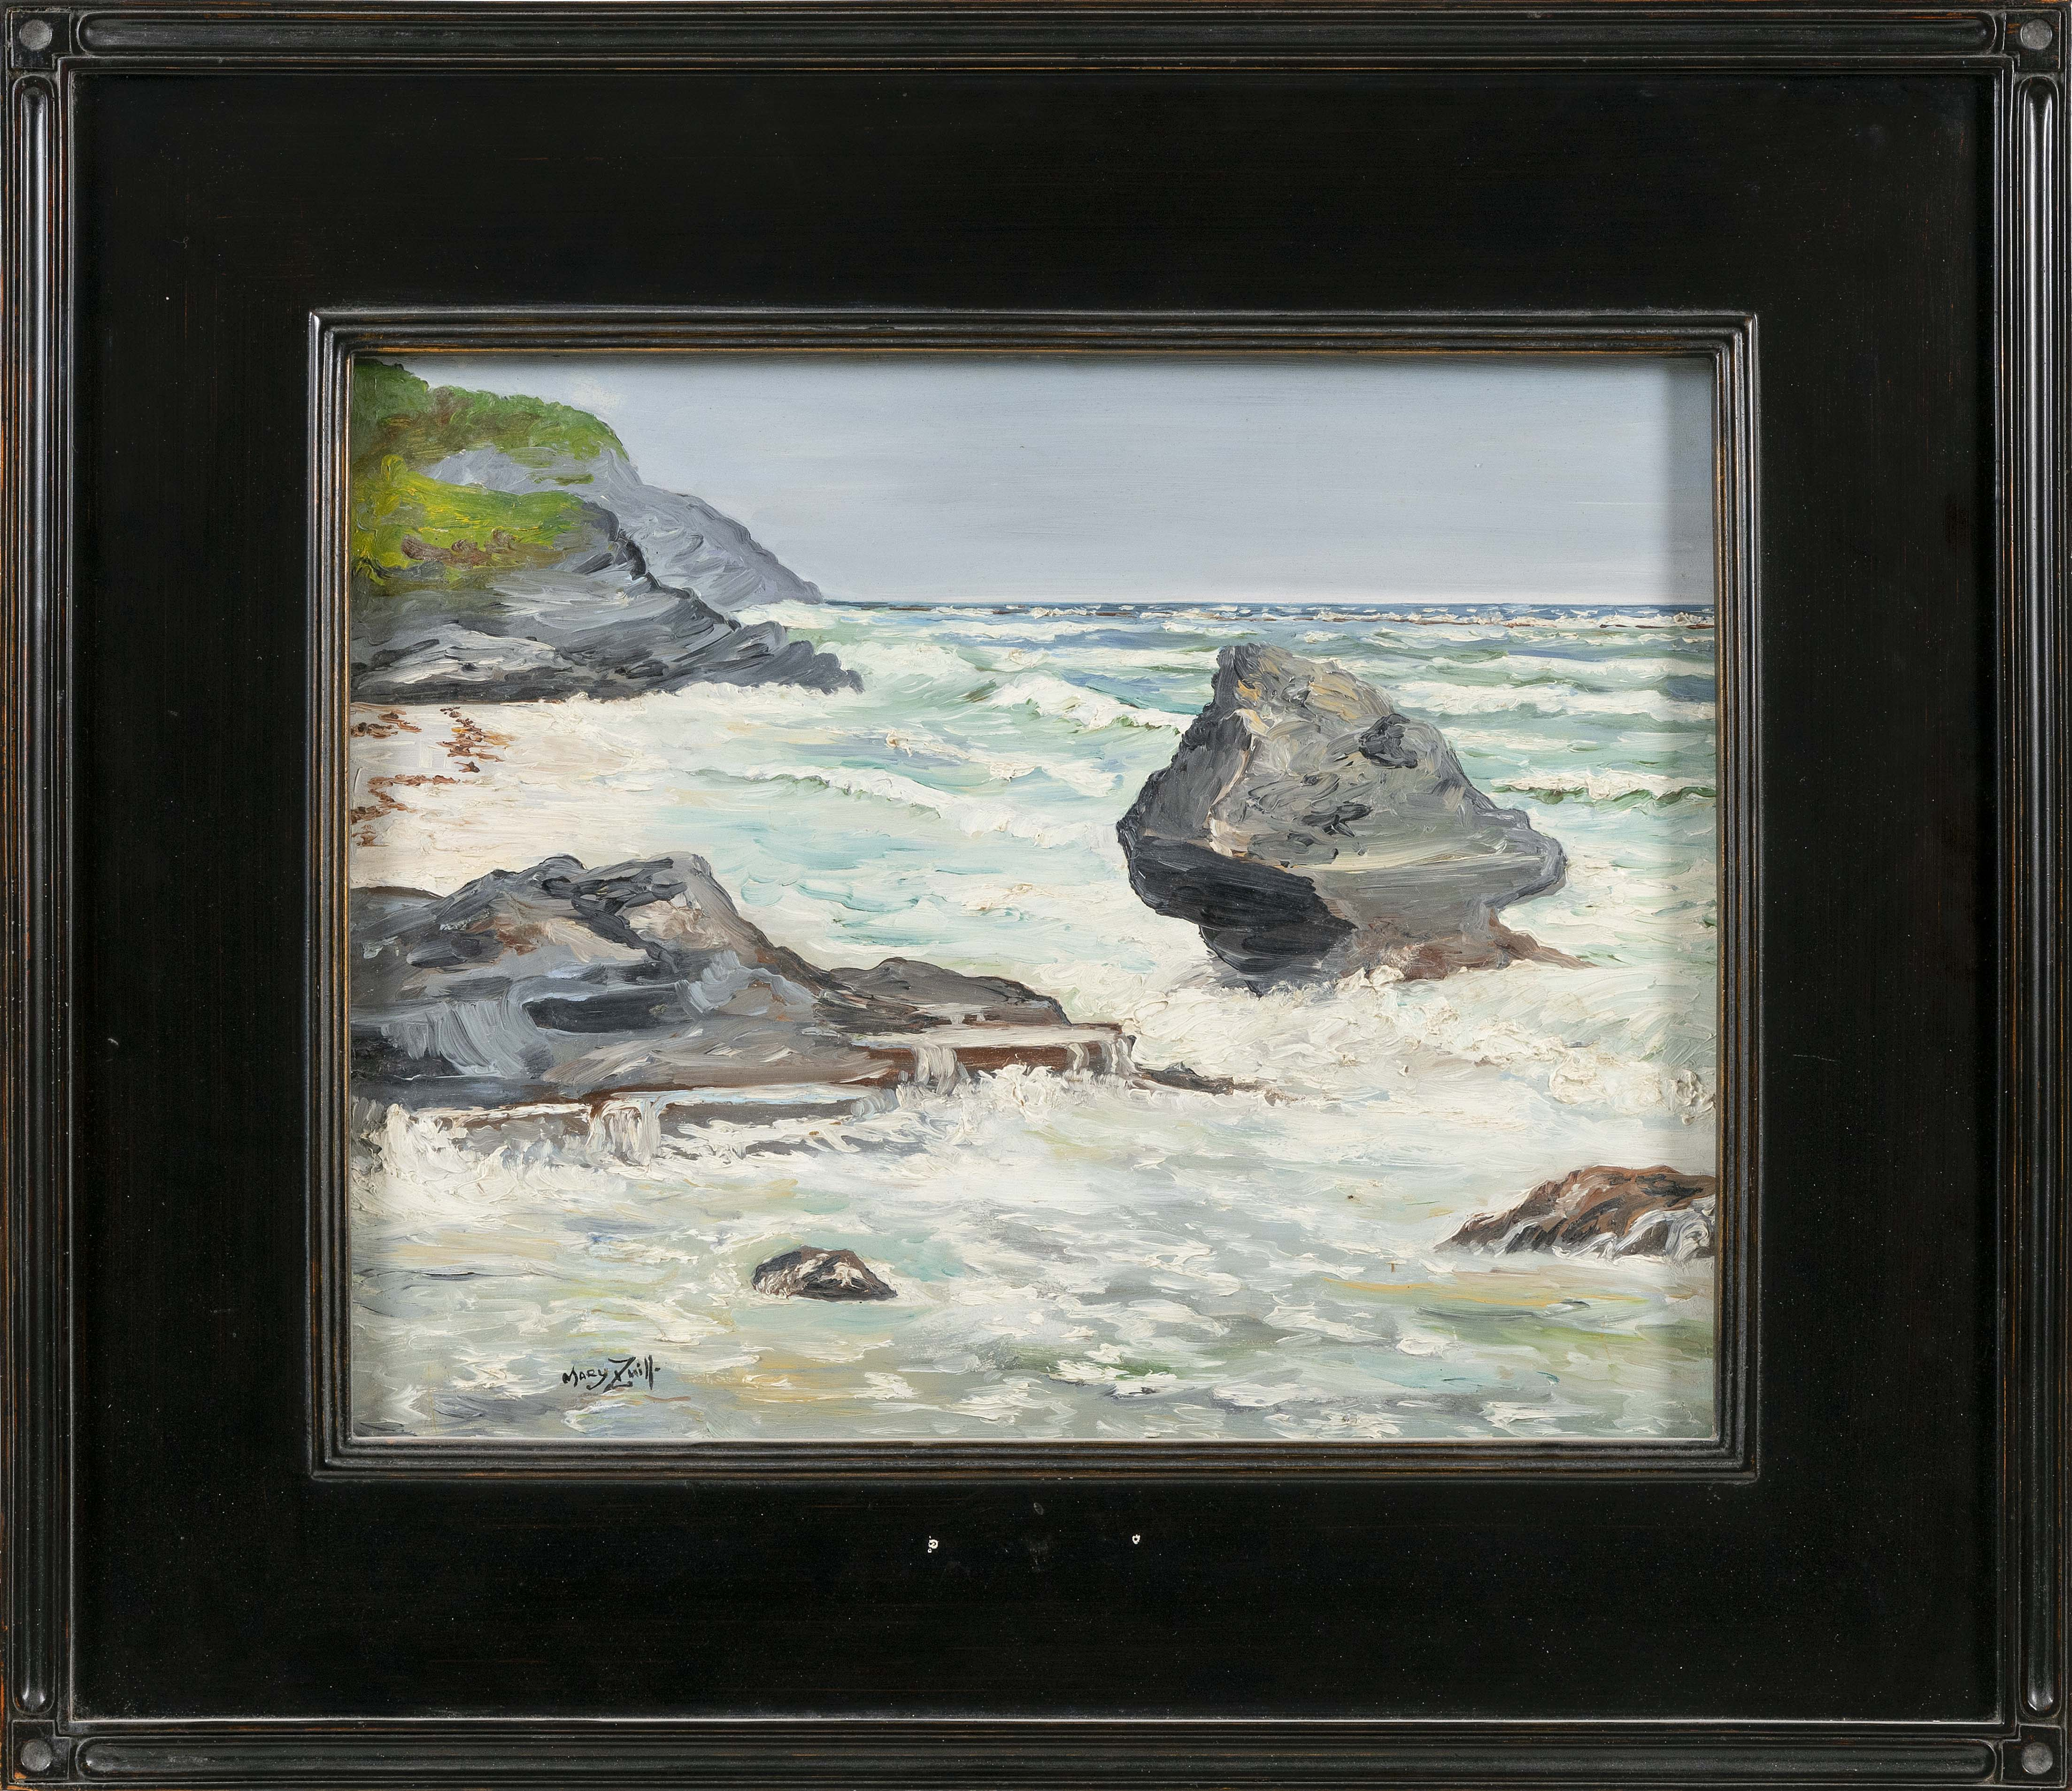 MARY ZUILL (Bermuda, 1916-1971), Rocky coastal scene., Oil on board, 16